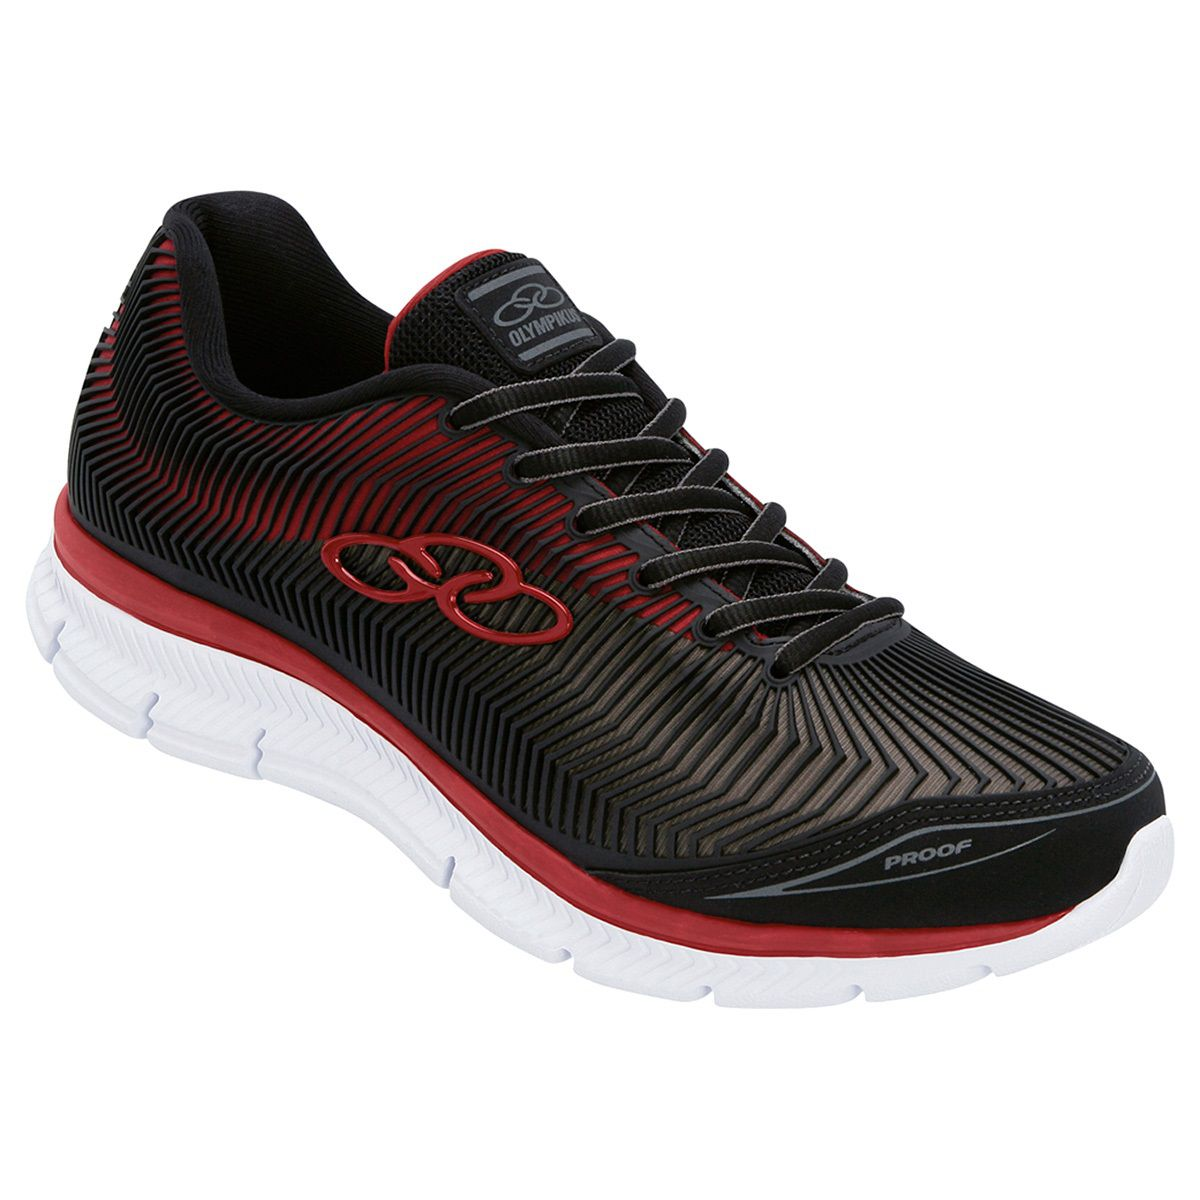 Tênis Masculino Proof Preto/vermelho Olympikus - 233